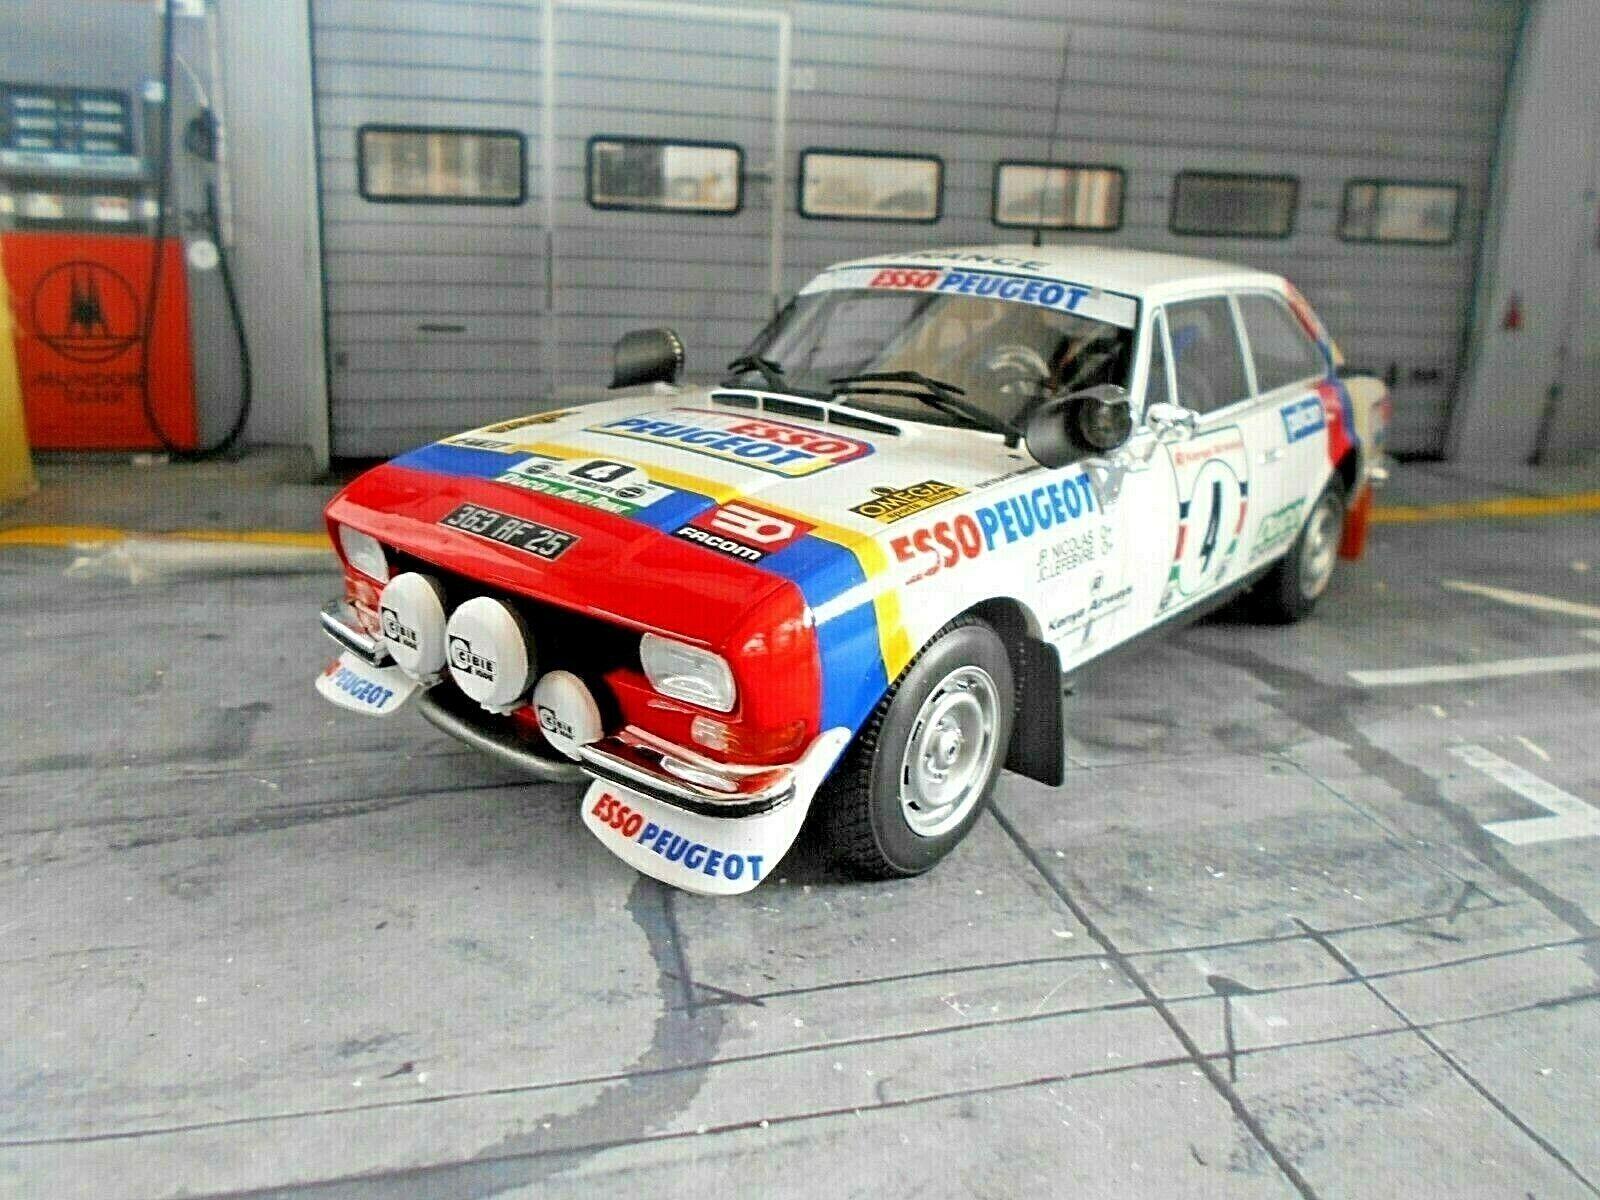 PEUGEOT 504 Gr.4 Coupe V6 Safari Rallye 1978  14 Nicolas Winner OTTO NEU 1 18